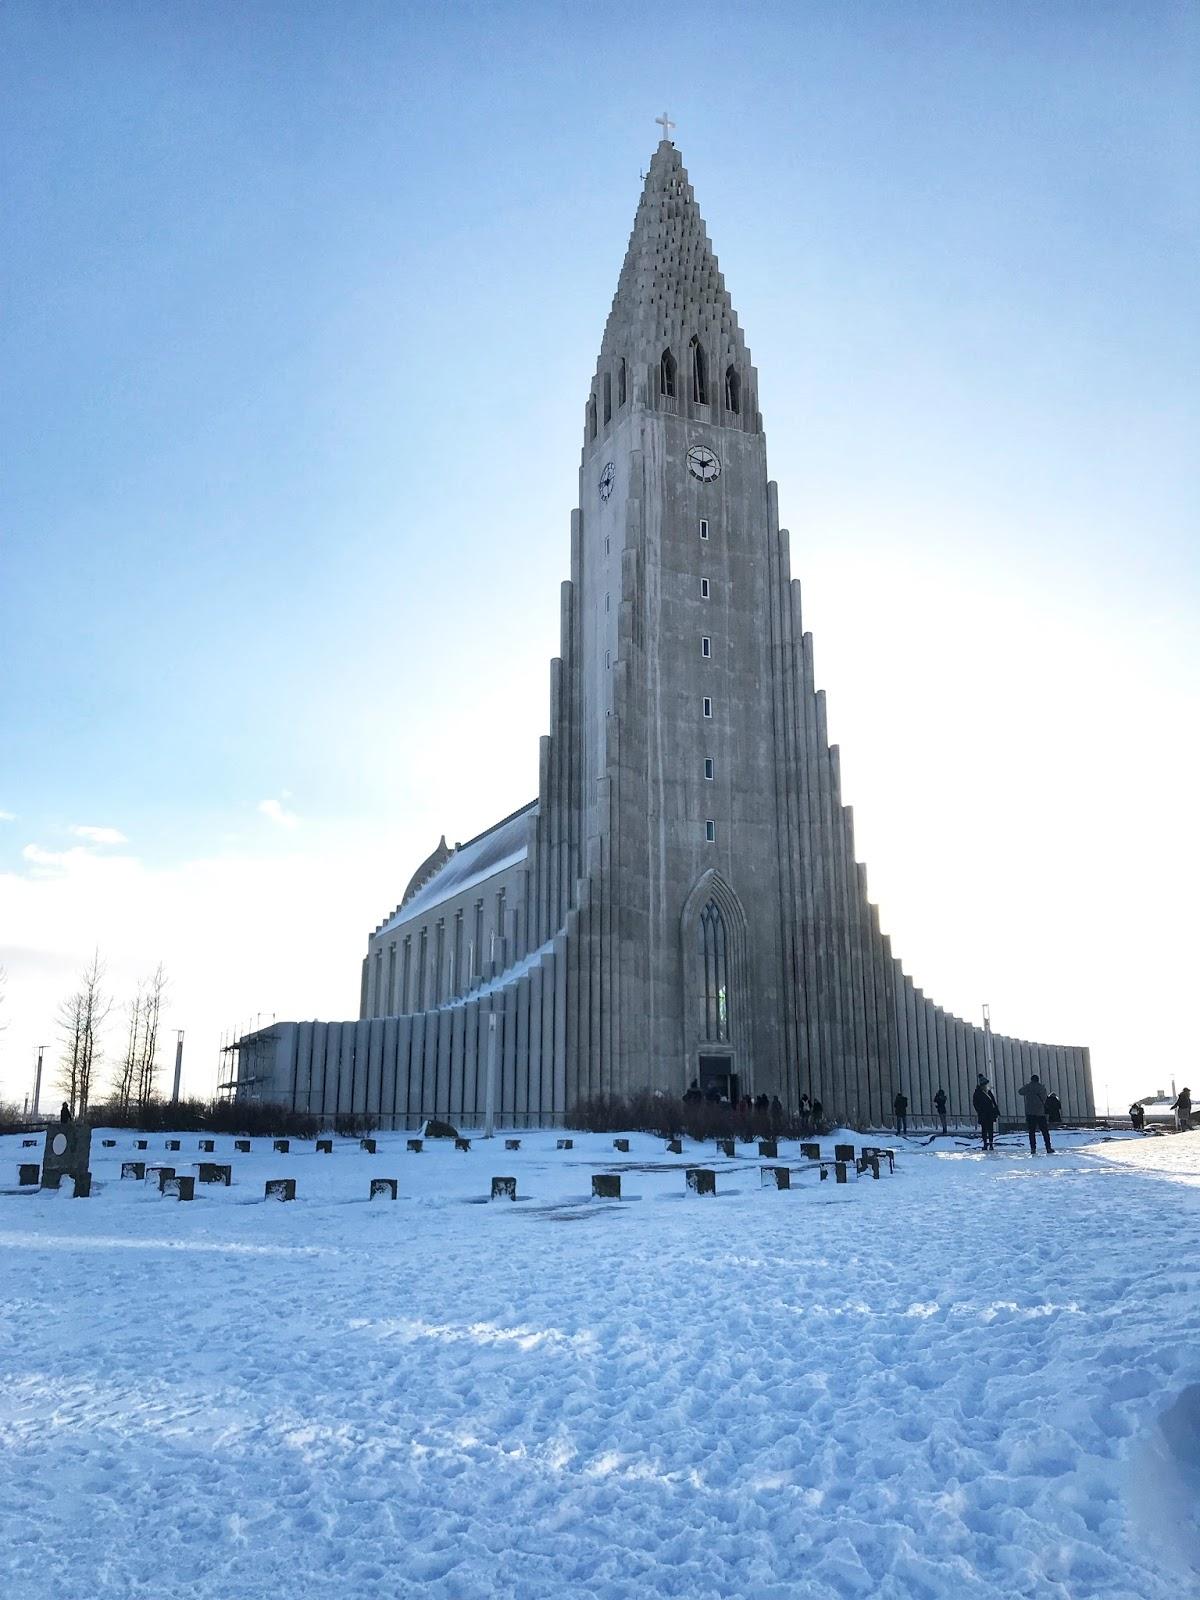 Image of Hallgrimskirkja in Reykjavik